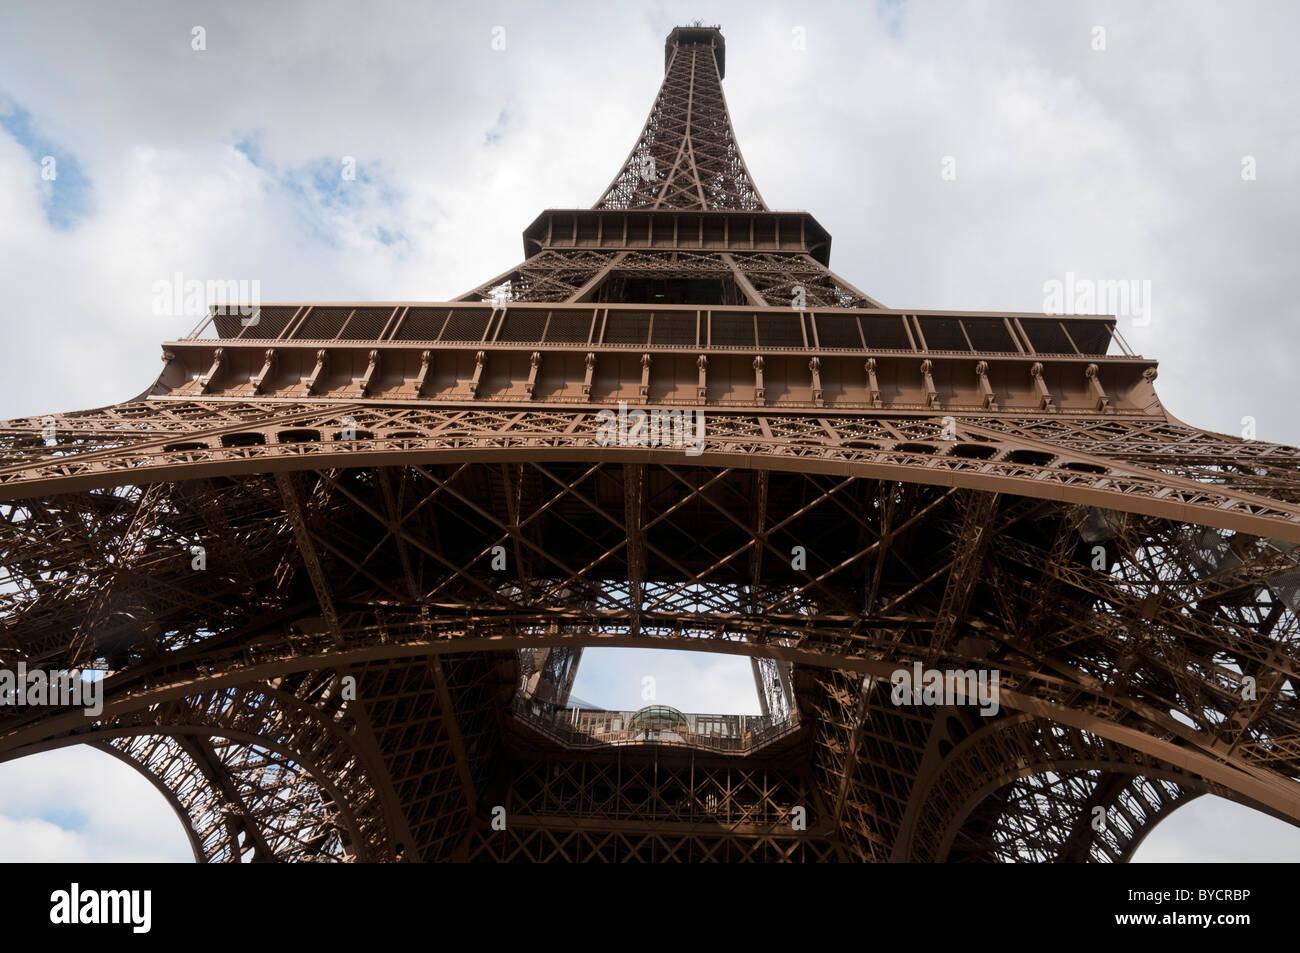 Tour Eiffel Torre Eiffel Foto de stock